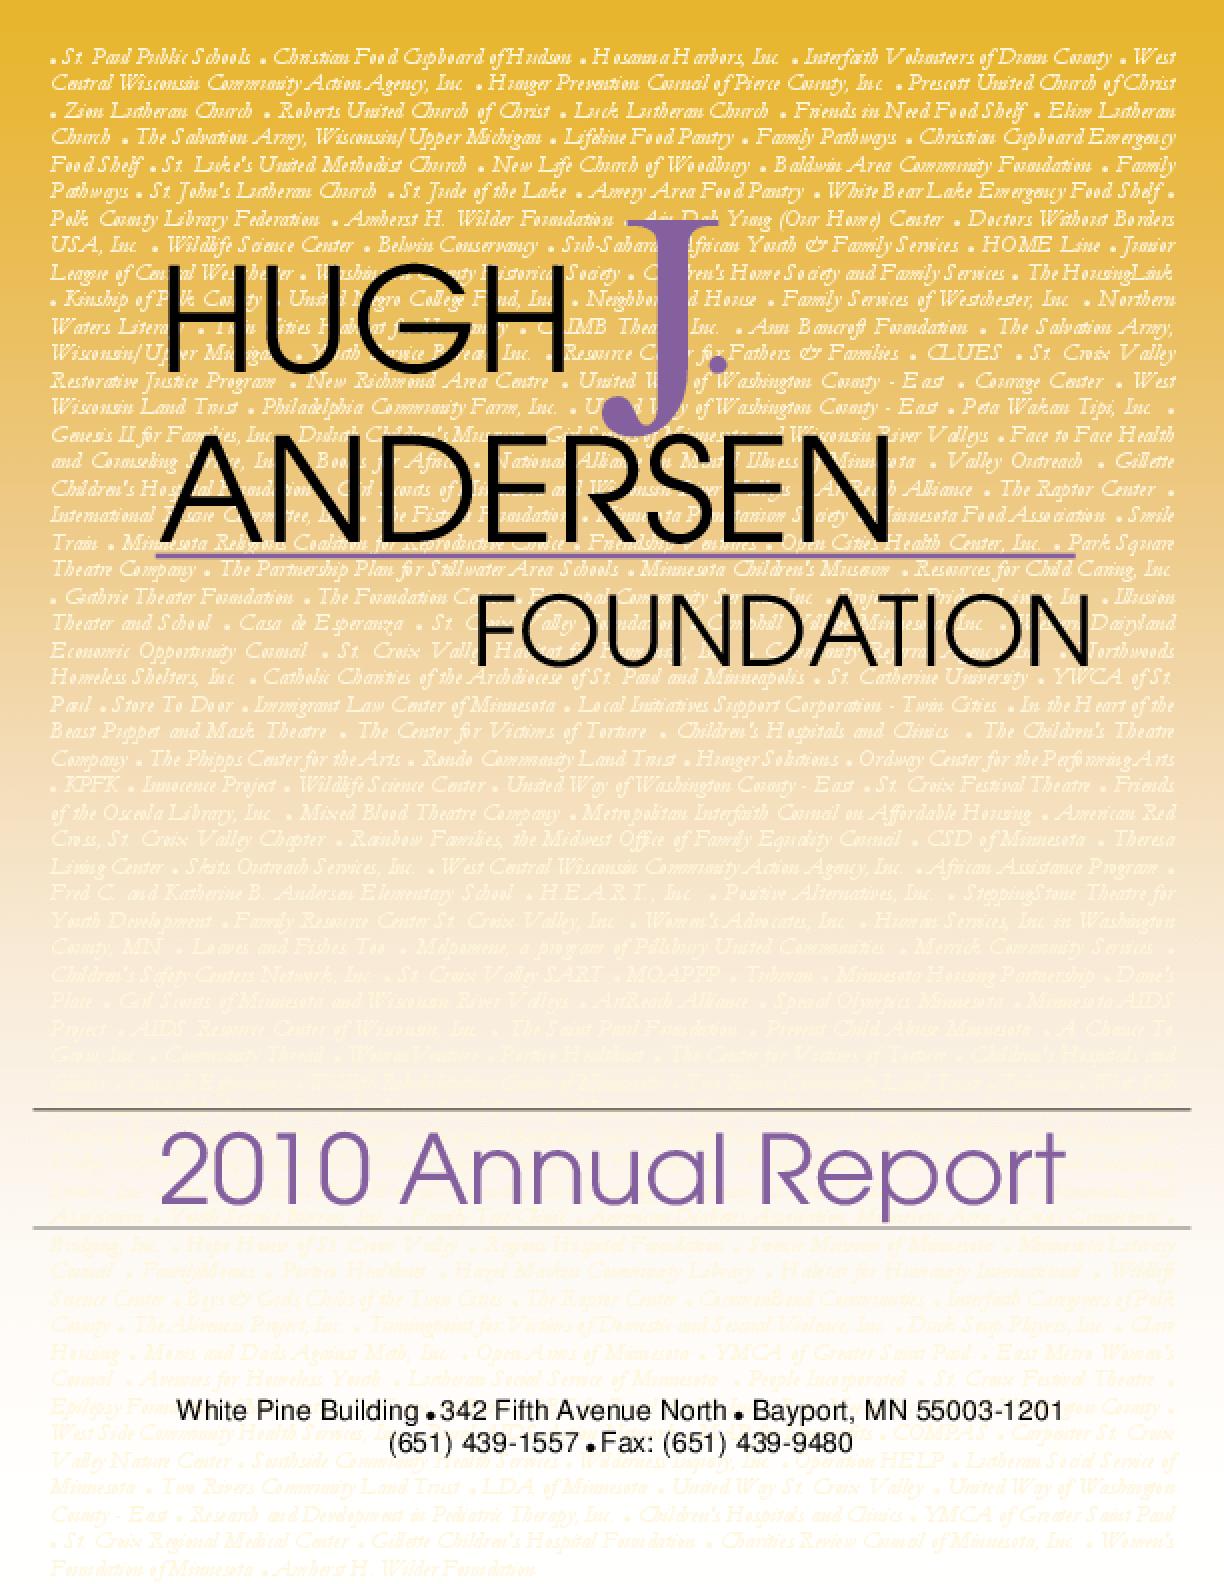 Hugh J. Andersen Foundation - 2010 Annual Report